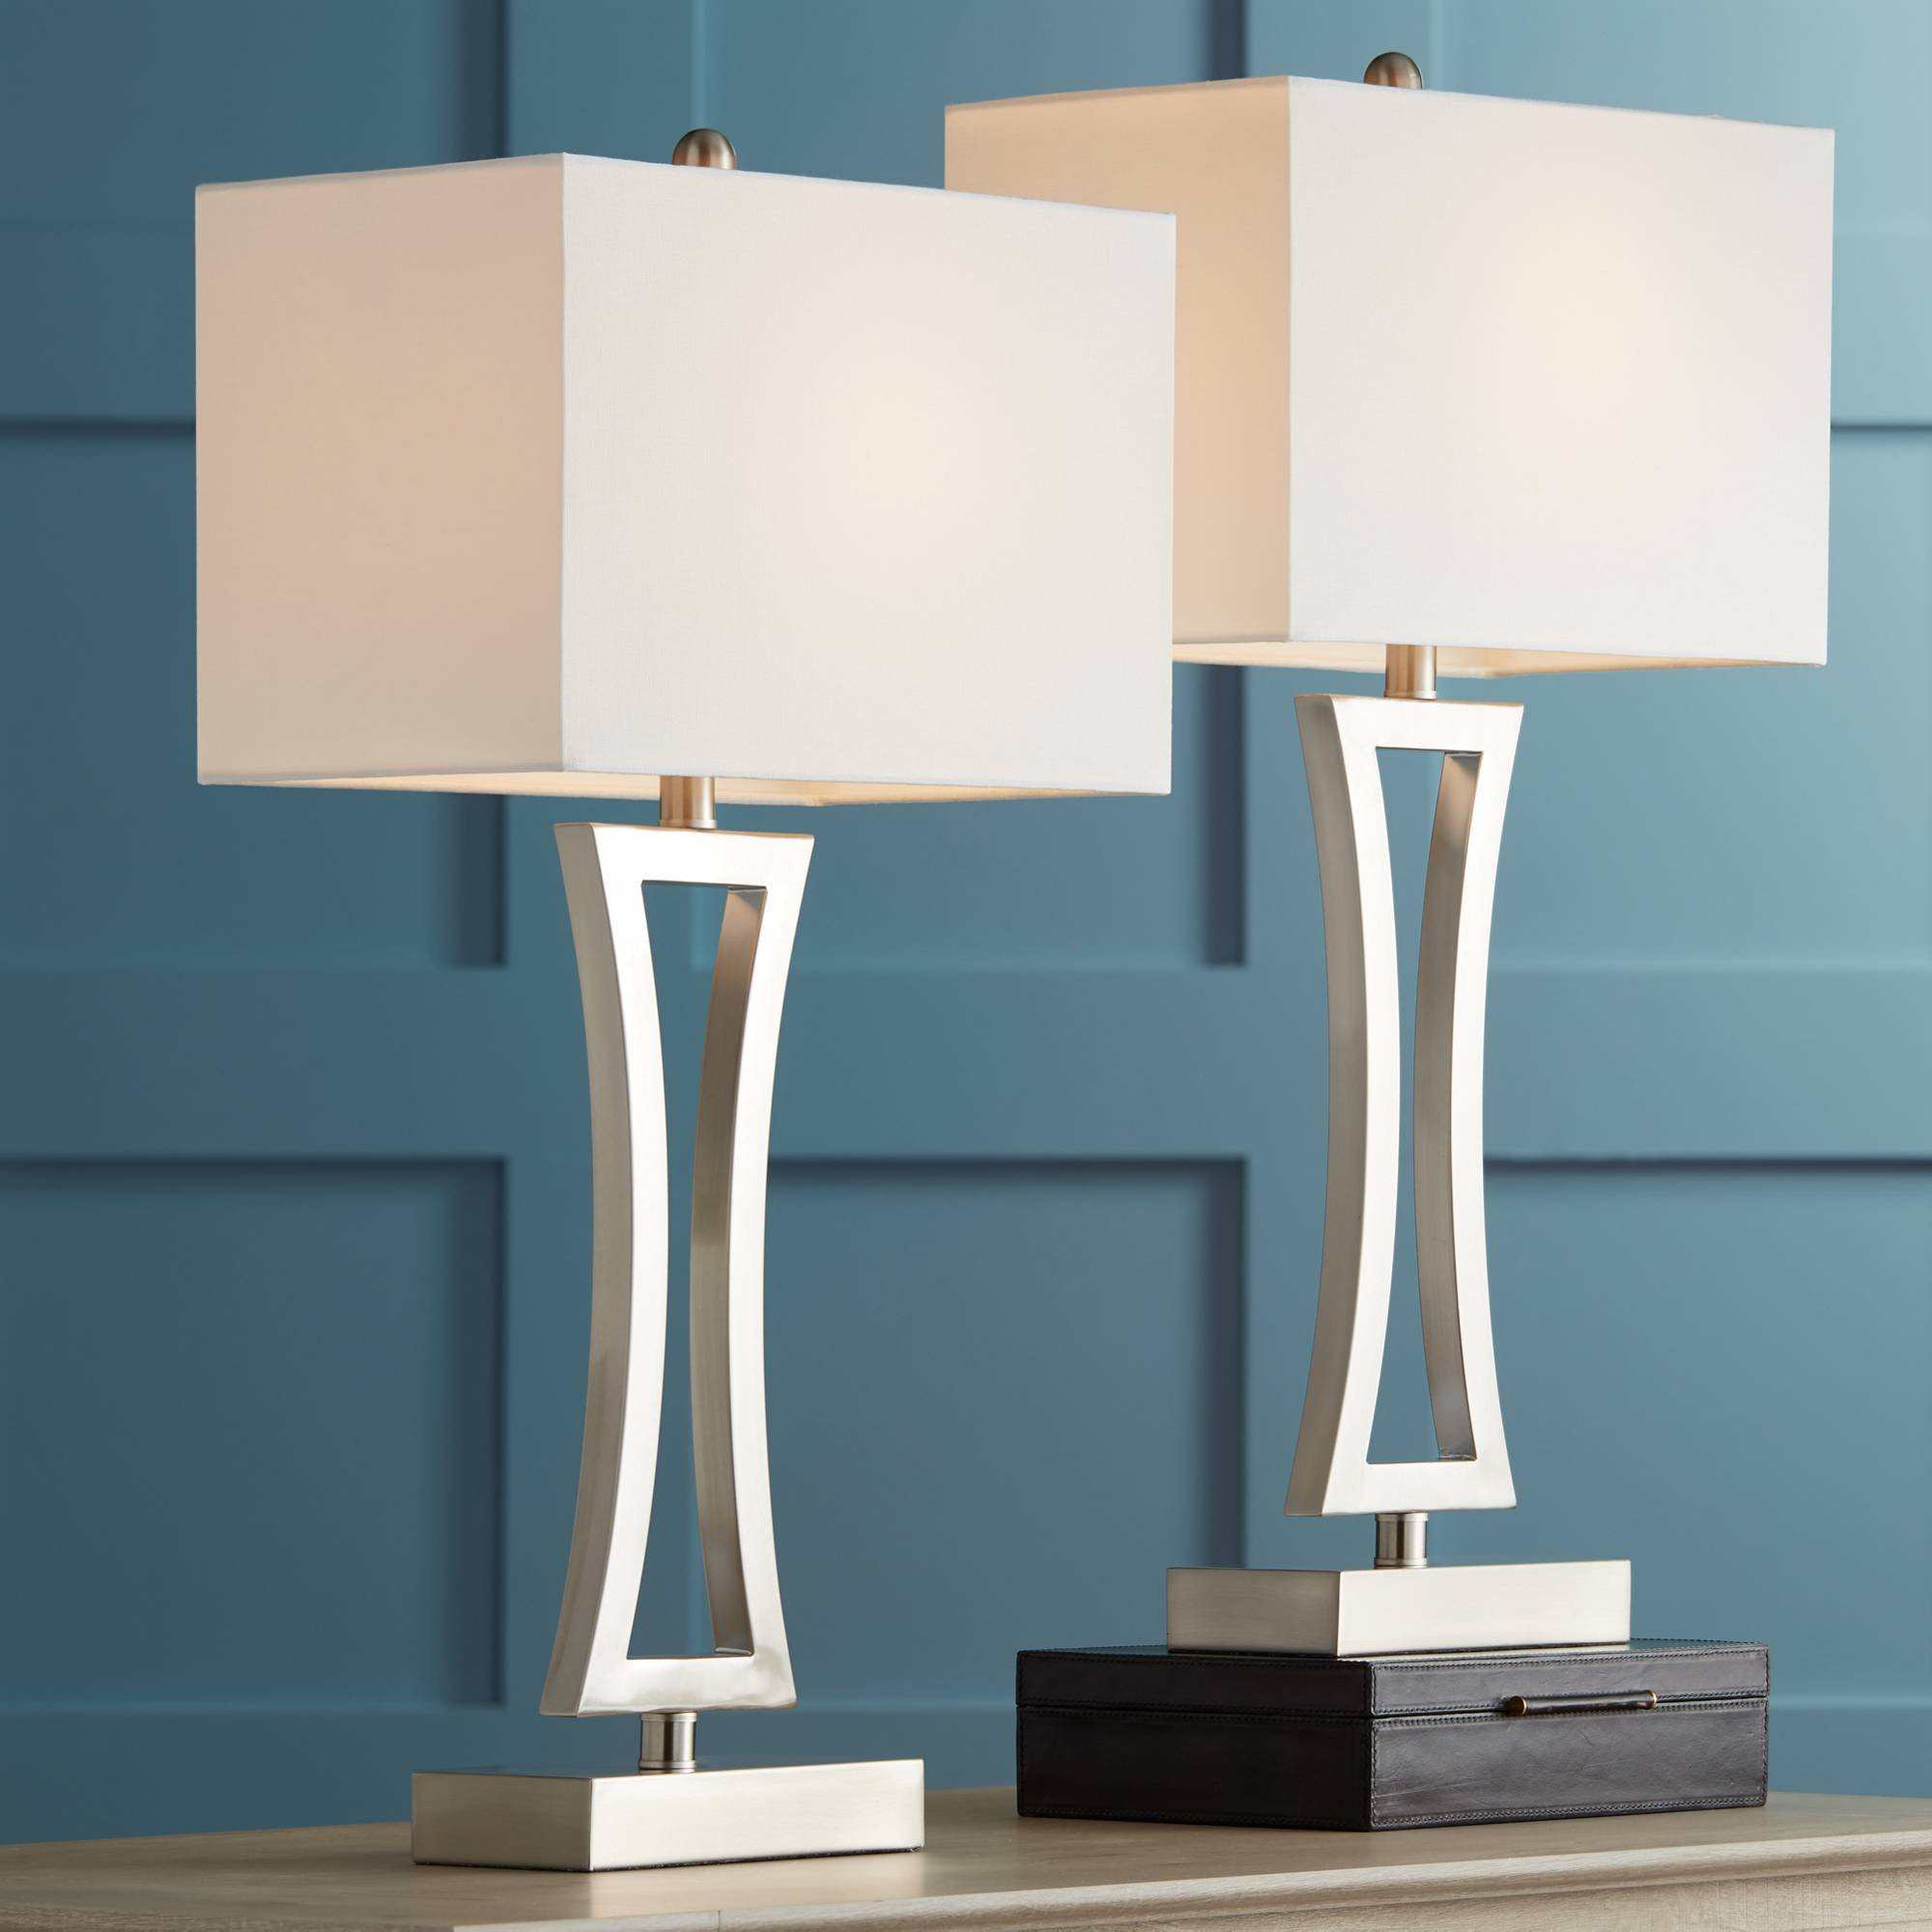 Details about Modern Table Lamps Set of 2 Brushed Steel for Living Room  Family Bedroom Bedside